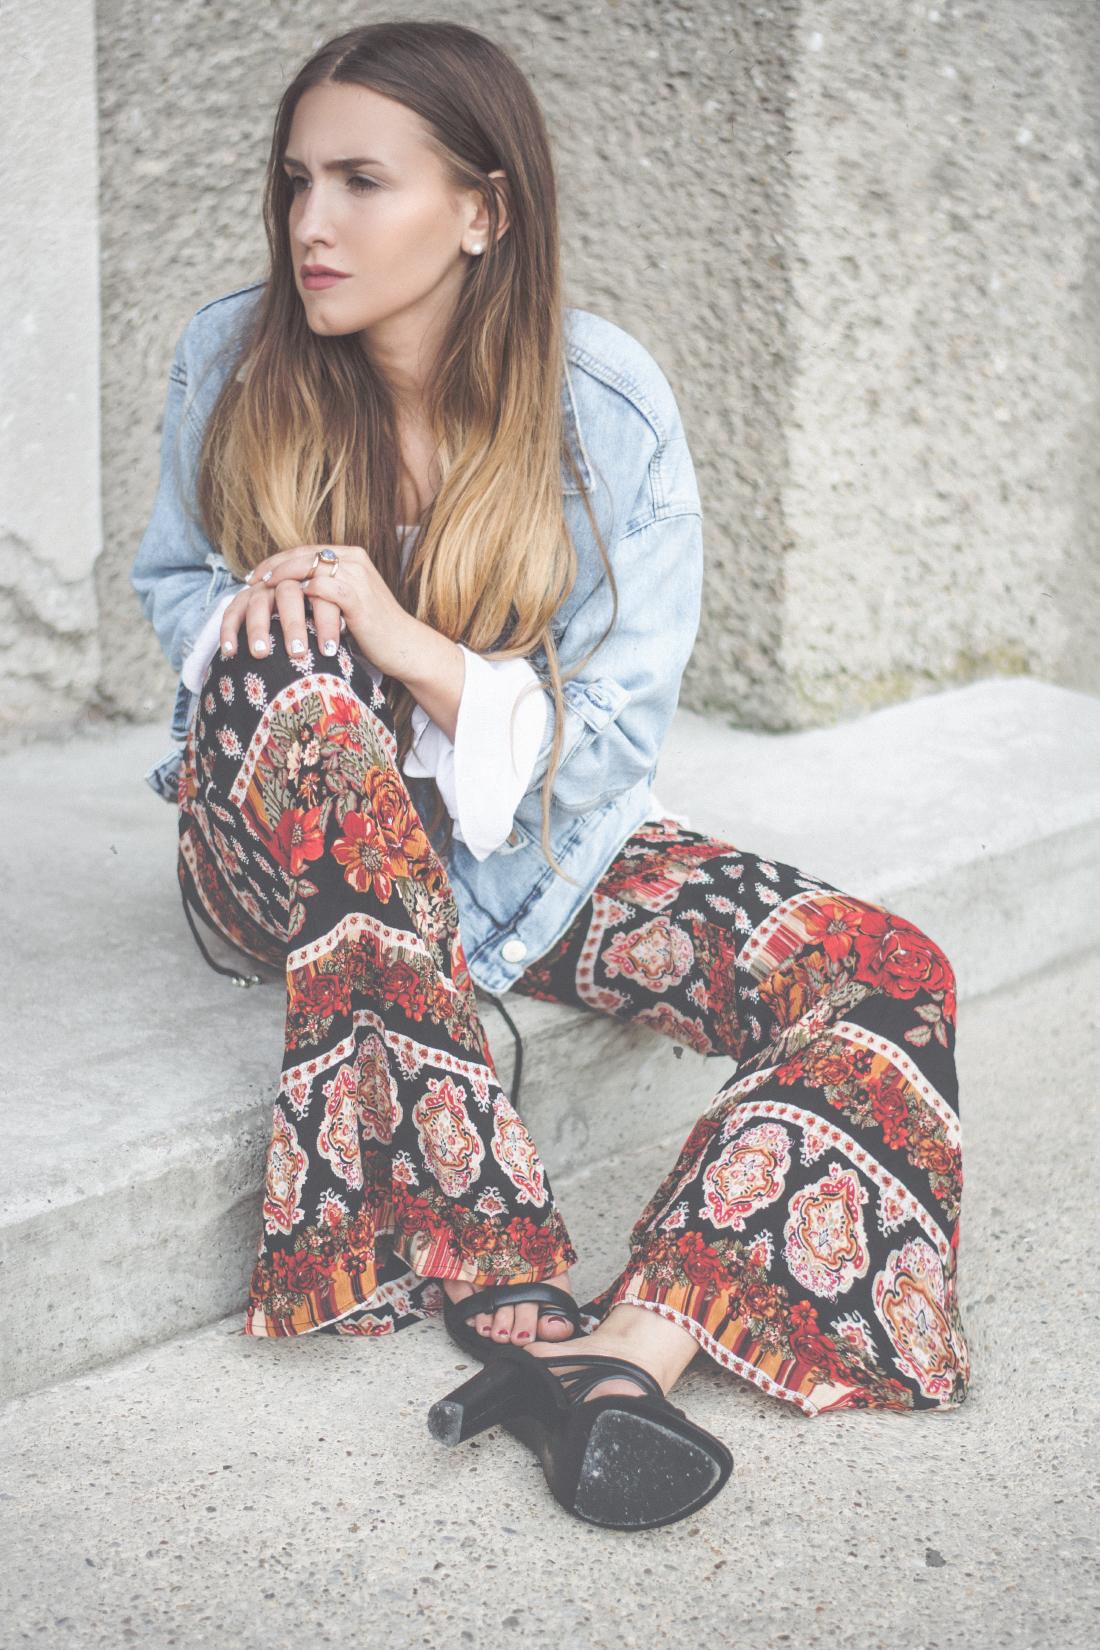 Fleared Pants - Glockenhosen - Trend Revival 2015